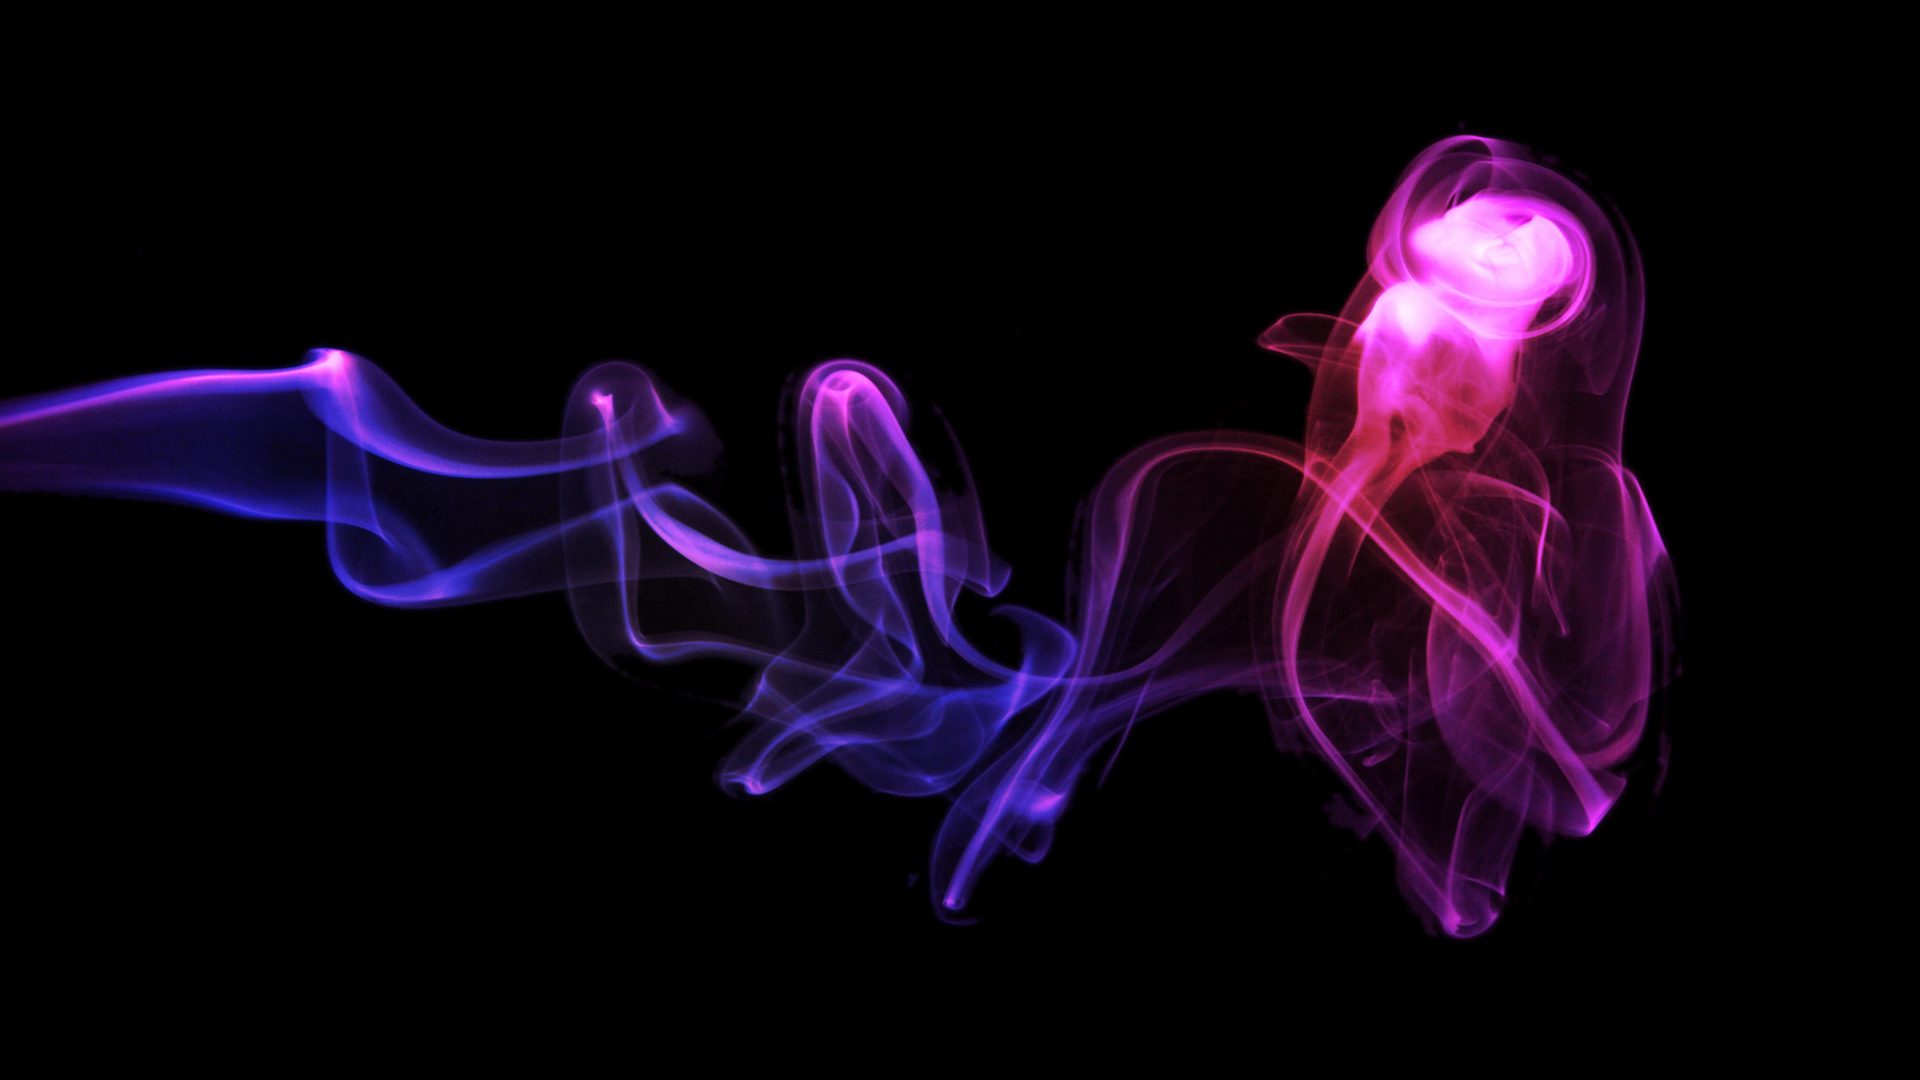 http://onlyhdwallpapers.com/wallpaper/minimalistic_pink_smoke_purple_3tones_abstract_desktop_1920x1080_wallpaper-234285.jpg